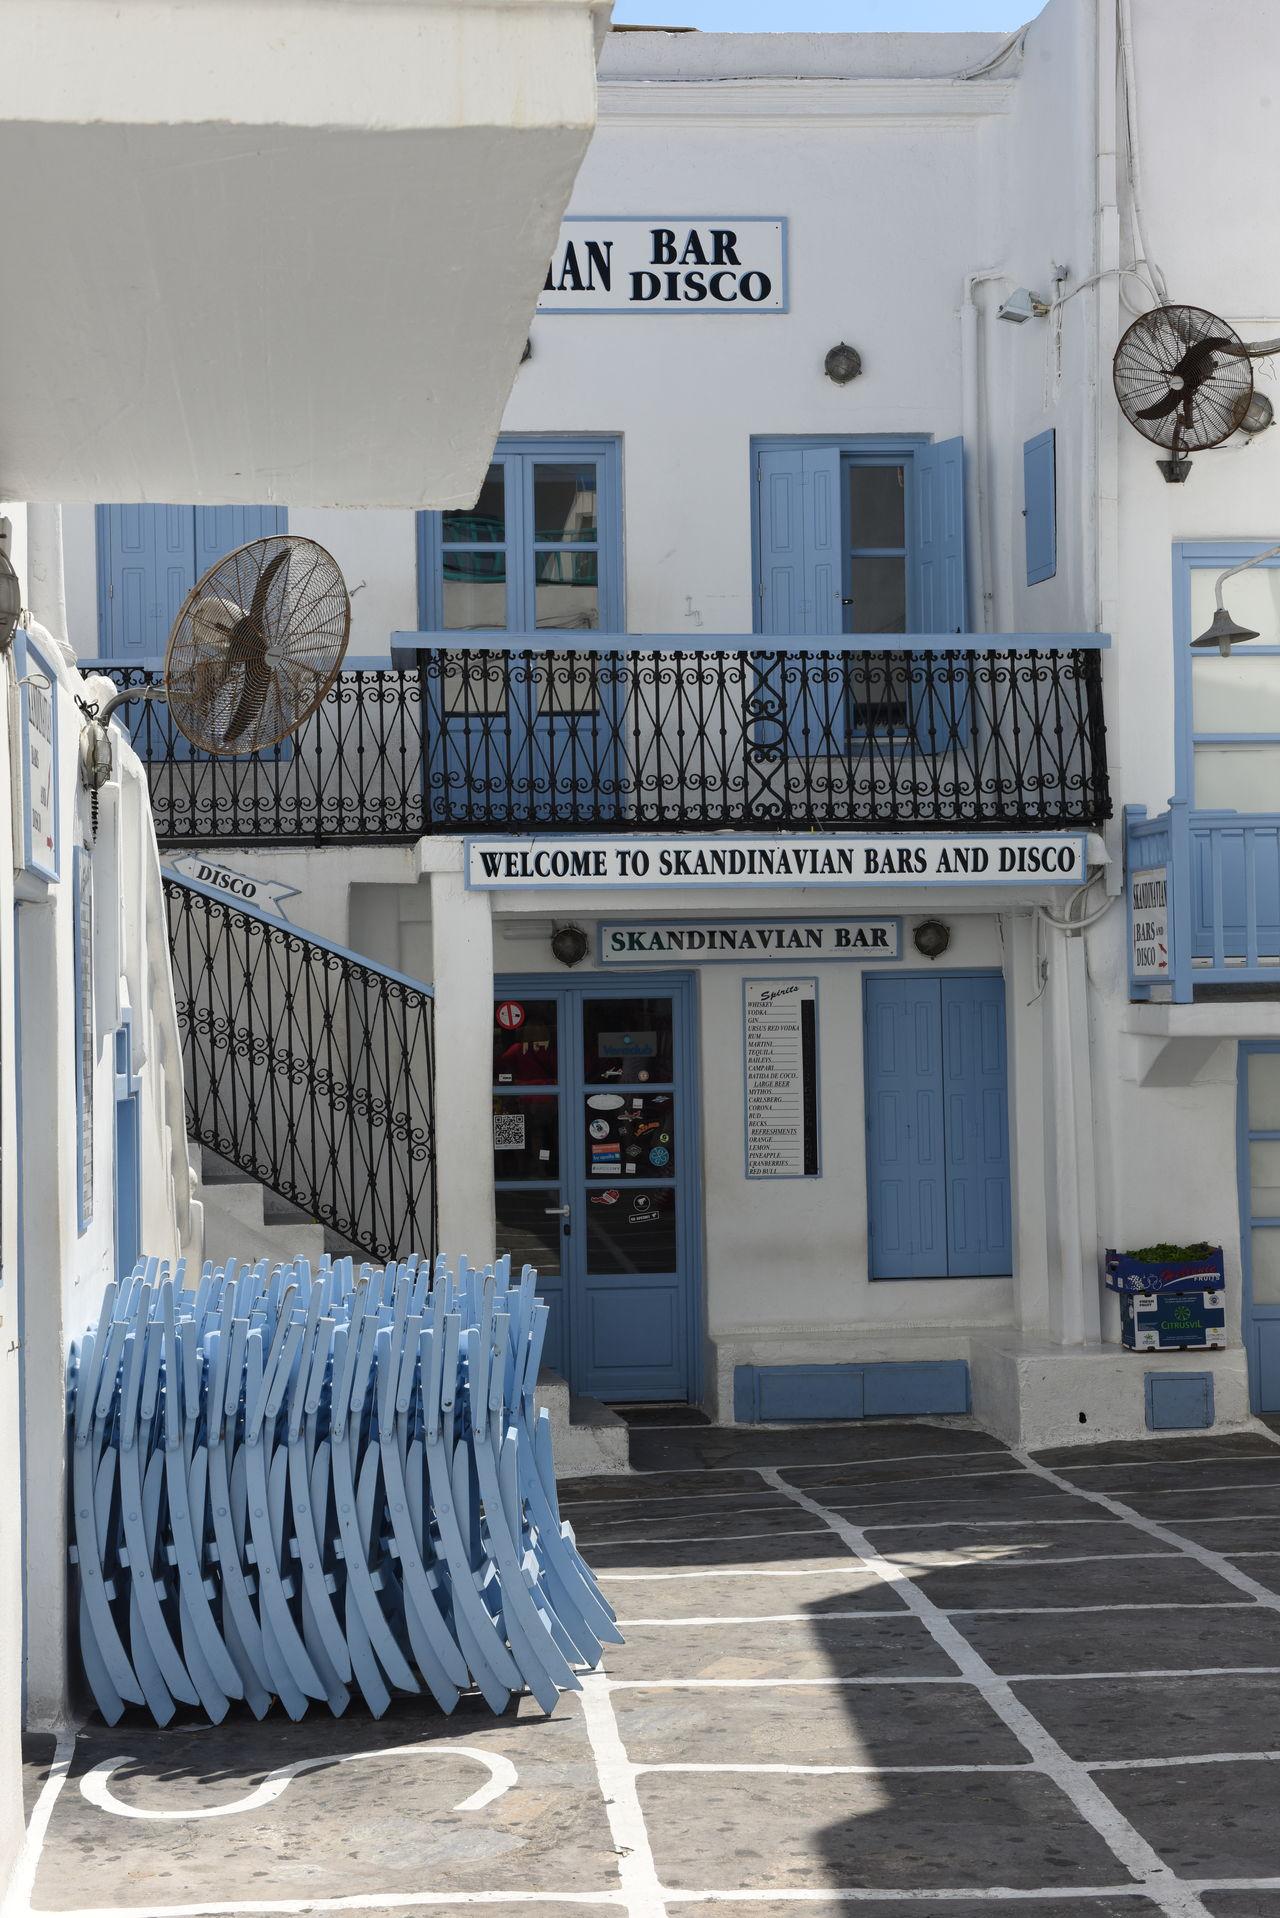 Aegean Aegean Islands Aegean Sea Bar Disco Greece GREECE ♥♥ Hellas Kykladen Kyklades Mykonos Mykonos,Greece Places Platz Straße Street ägaisches Meer ägäis ägäische Inseln